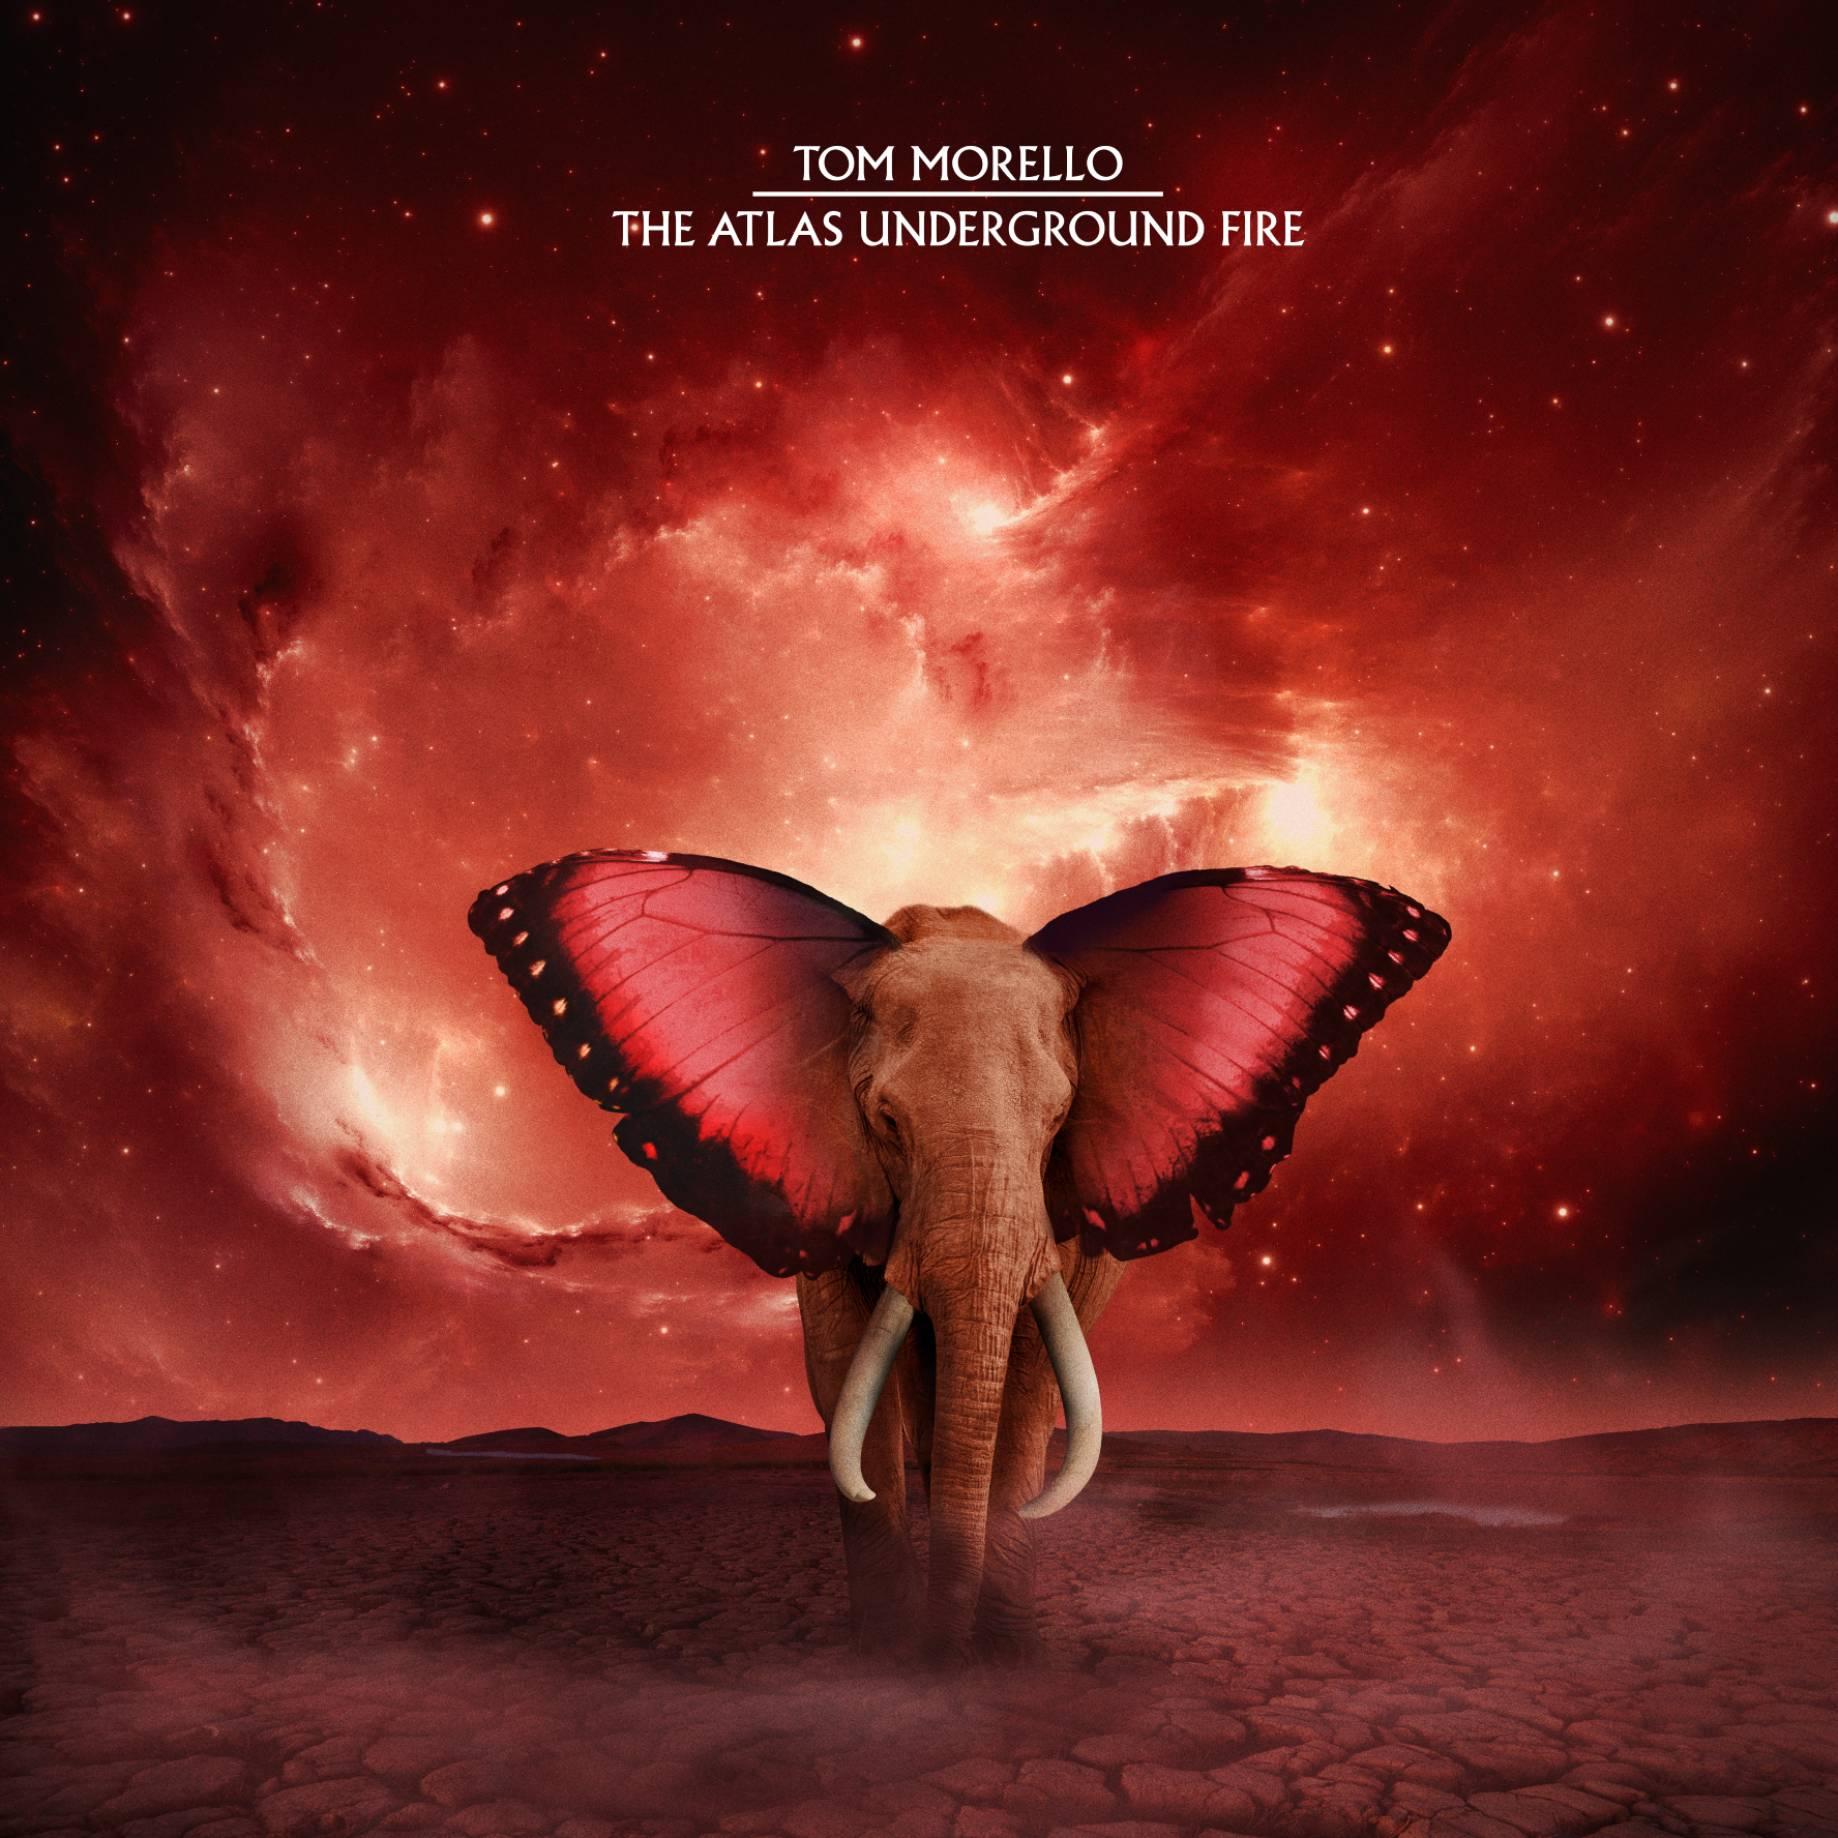 Tom Morello - 'The Atlas Underground Fire'